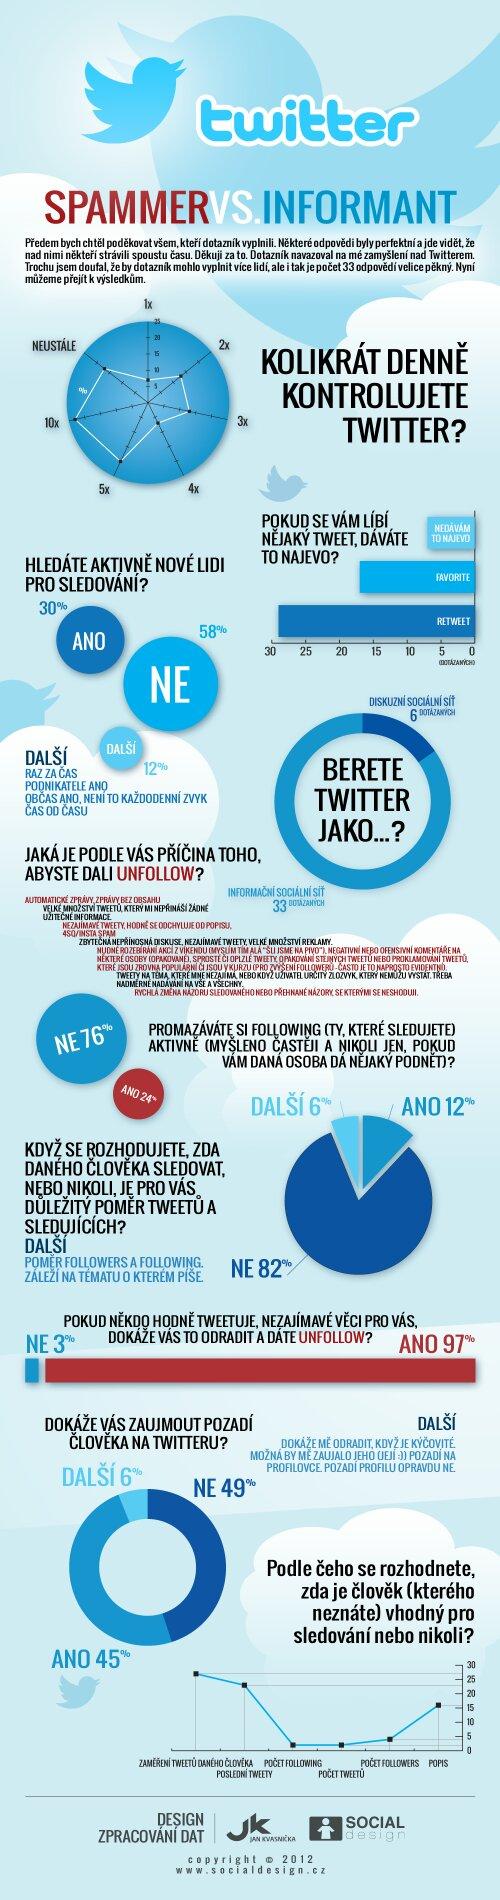 Spammer vs Informant - infografika